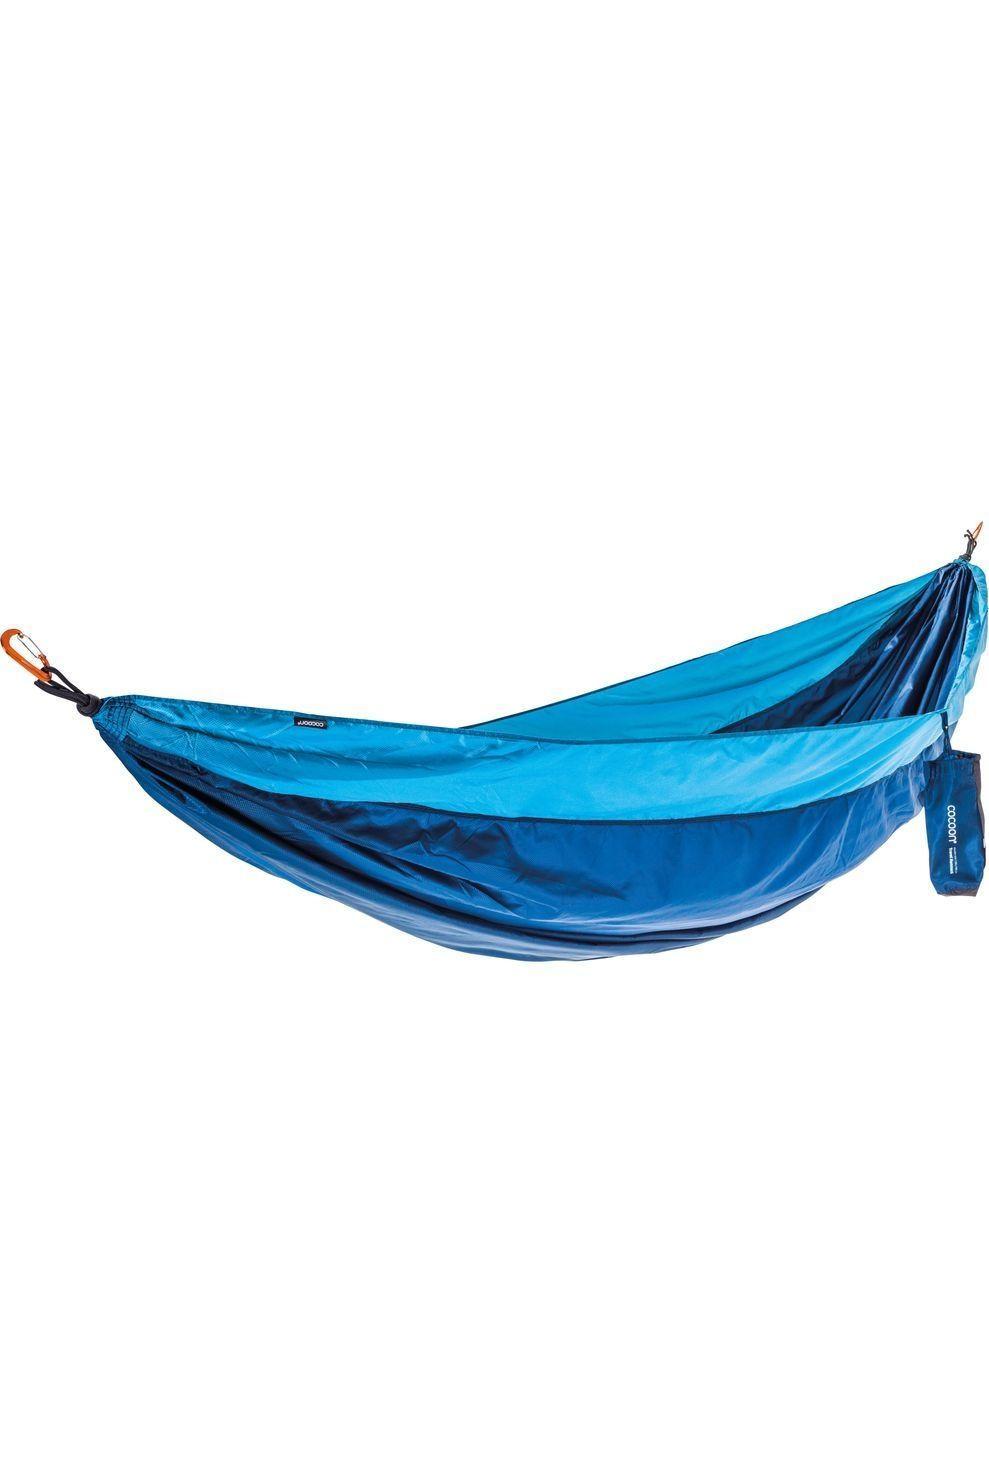 Cocoon Hangmat 2-Person Hammock - Blauw